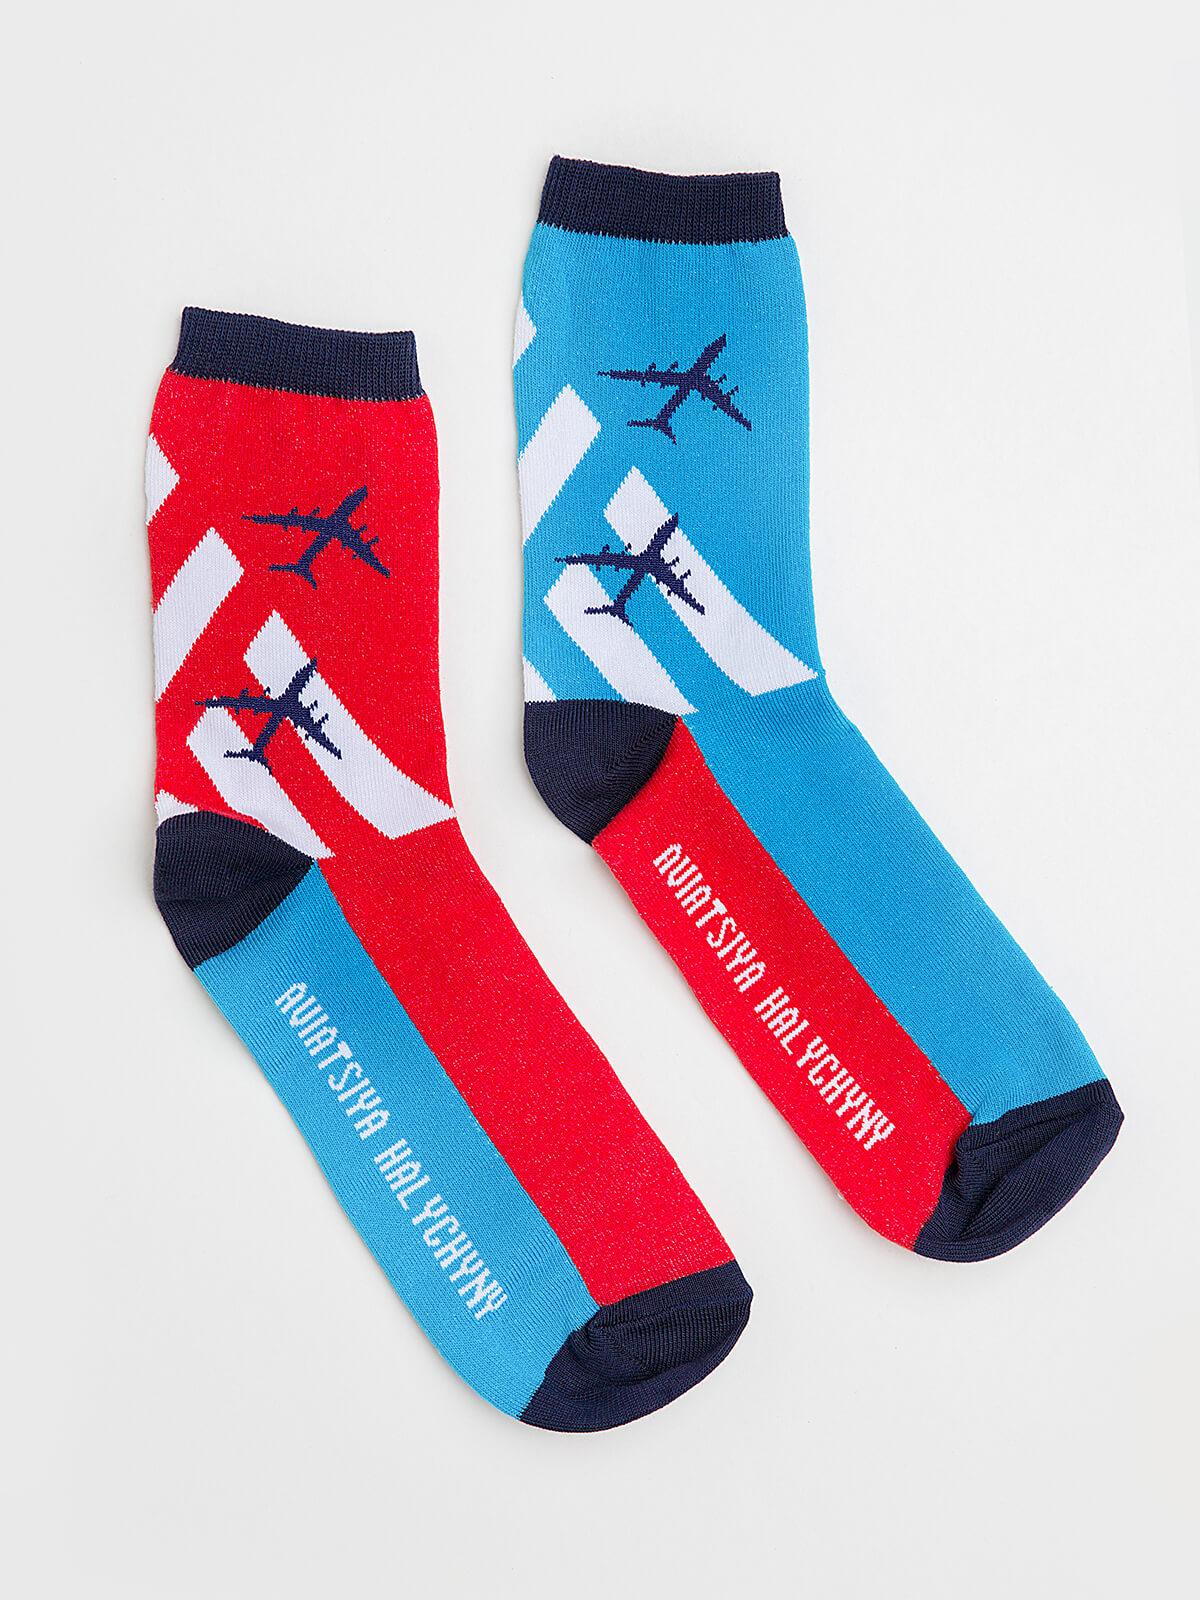 Socks Ruslan. Color turquoise. Socks: unisex Material: 95% cotton, 5% elastane.